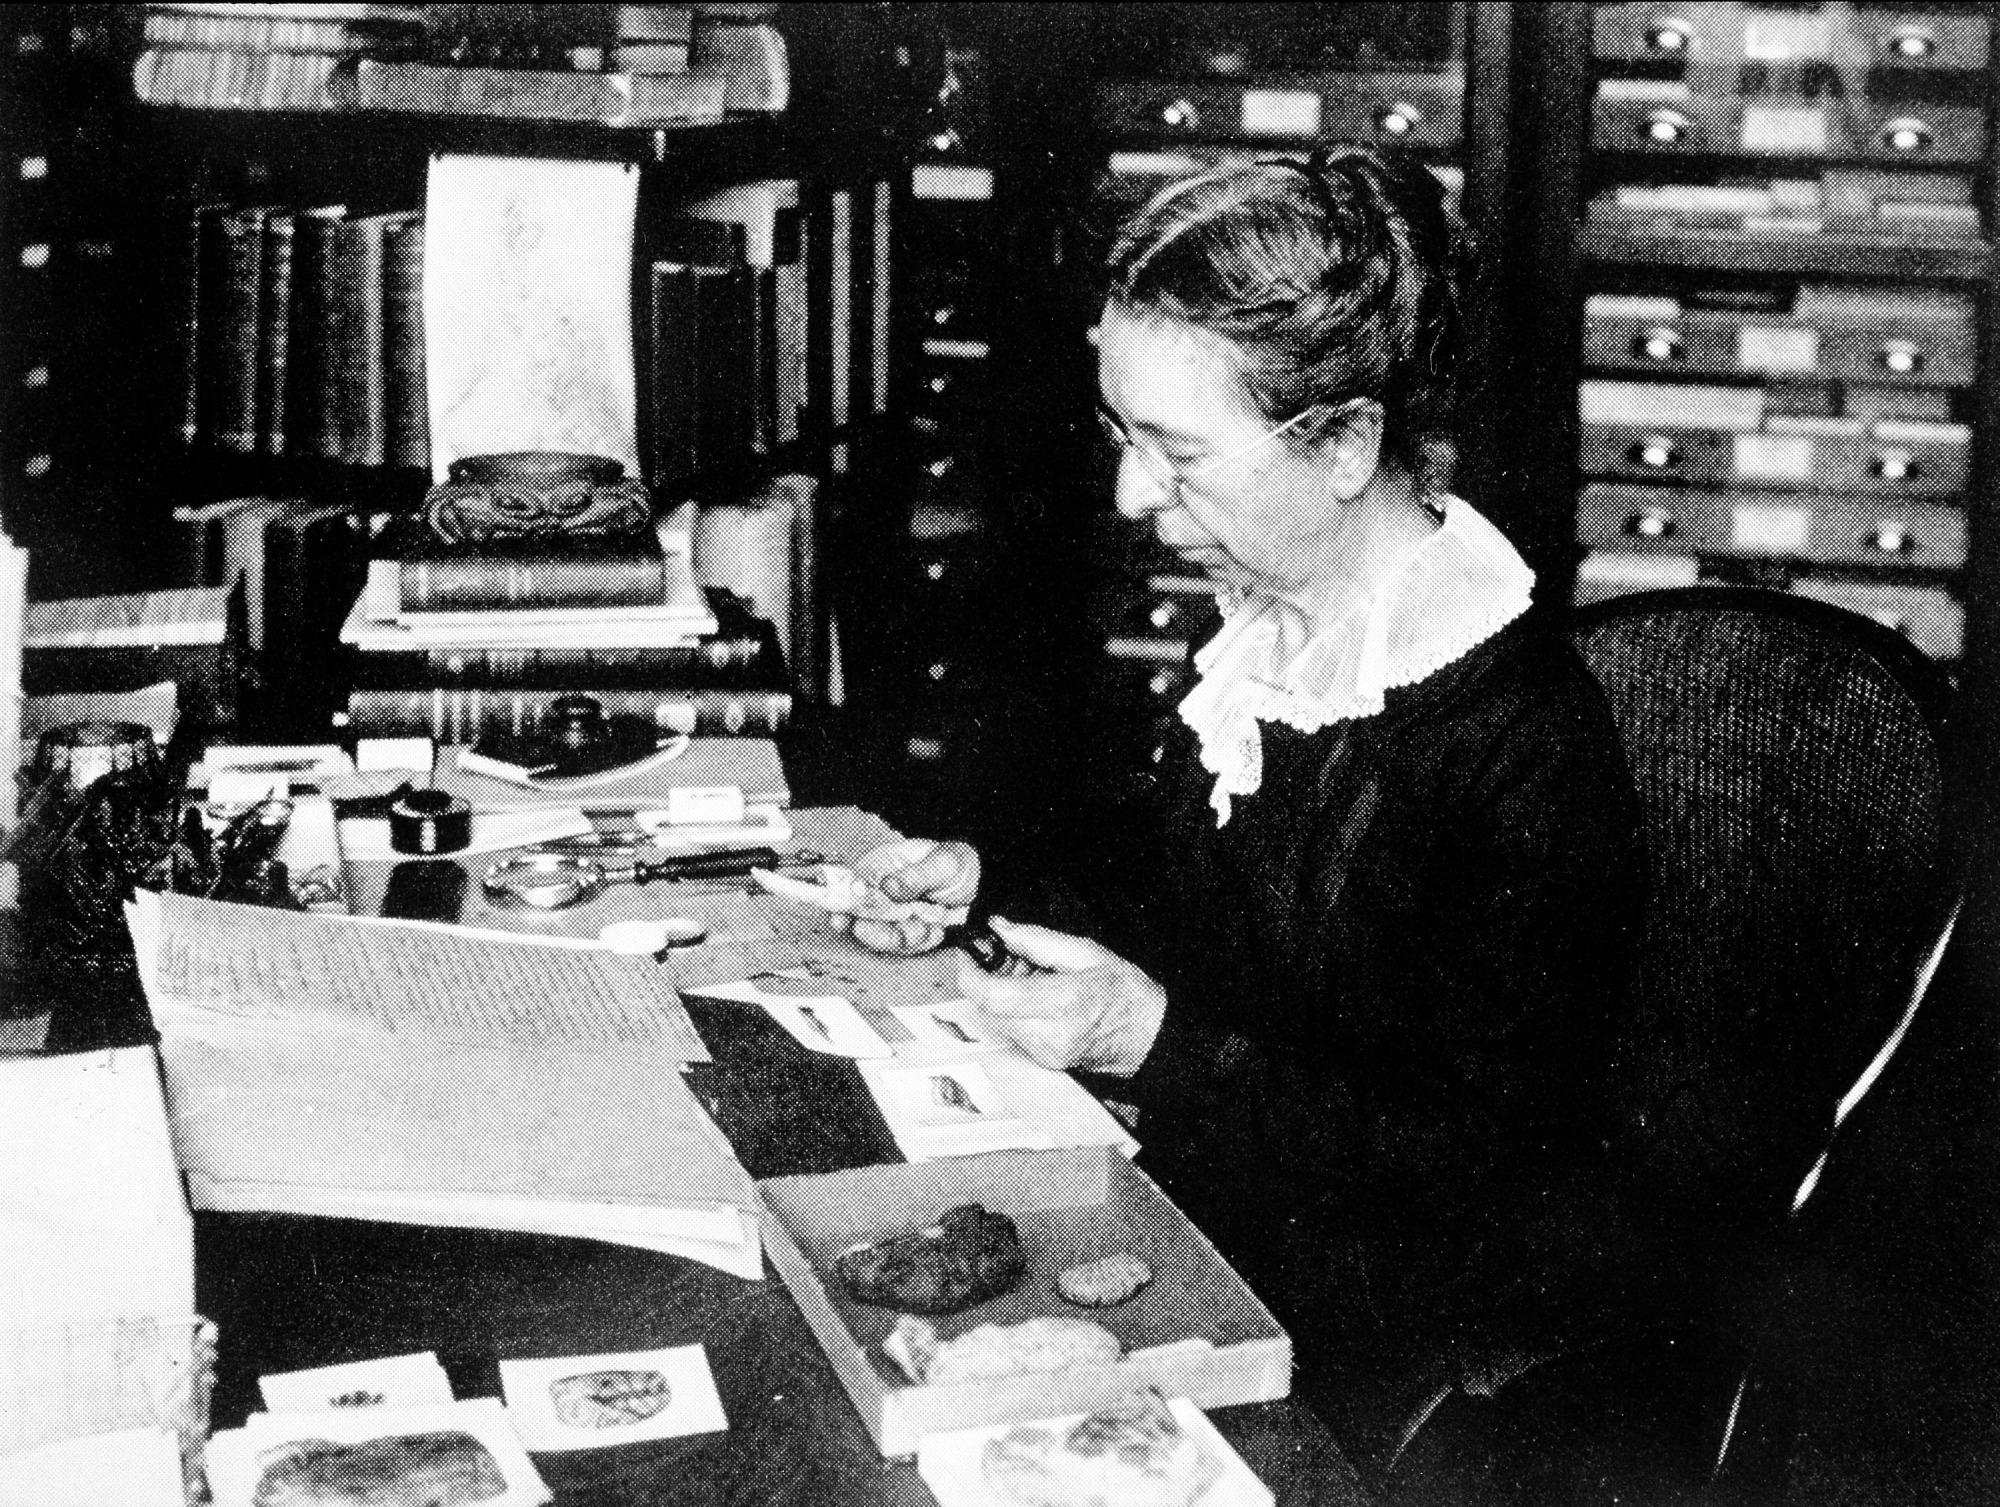 Mary Jane Rathbun Working with Specimens